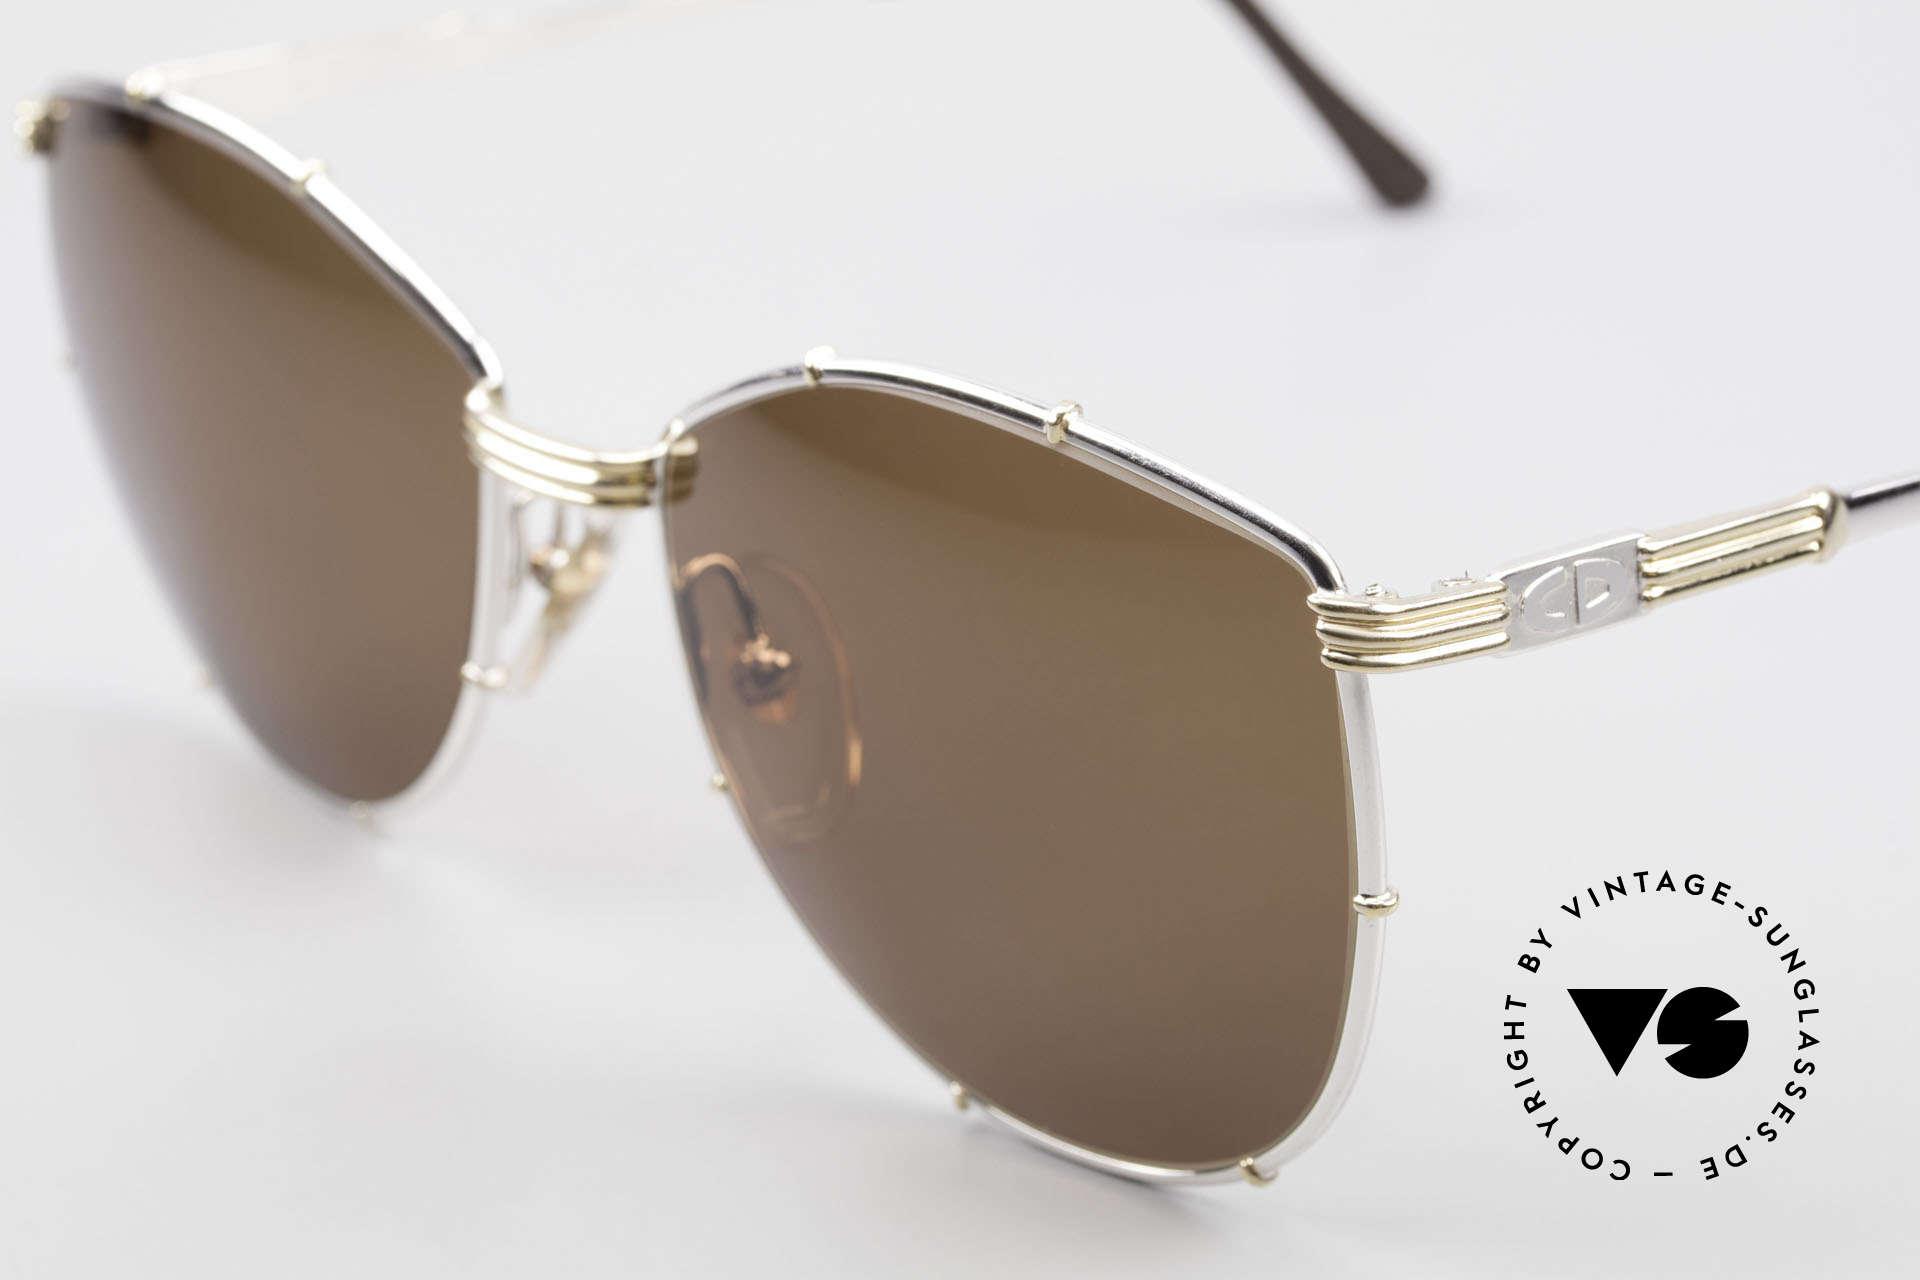 Christian Dior 2472 80's Vintage Designer Shades, never worn, NOS (like all our rare 80's sunglasses), Made for Women